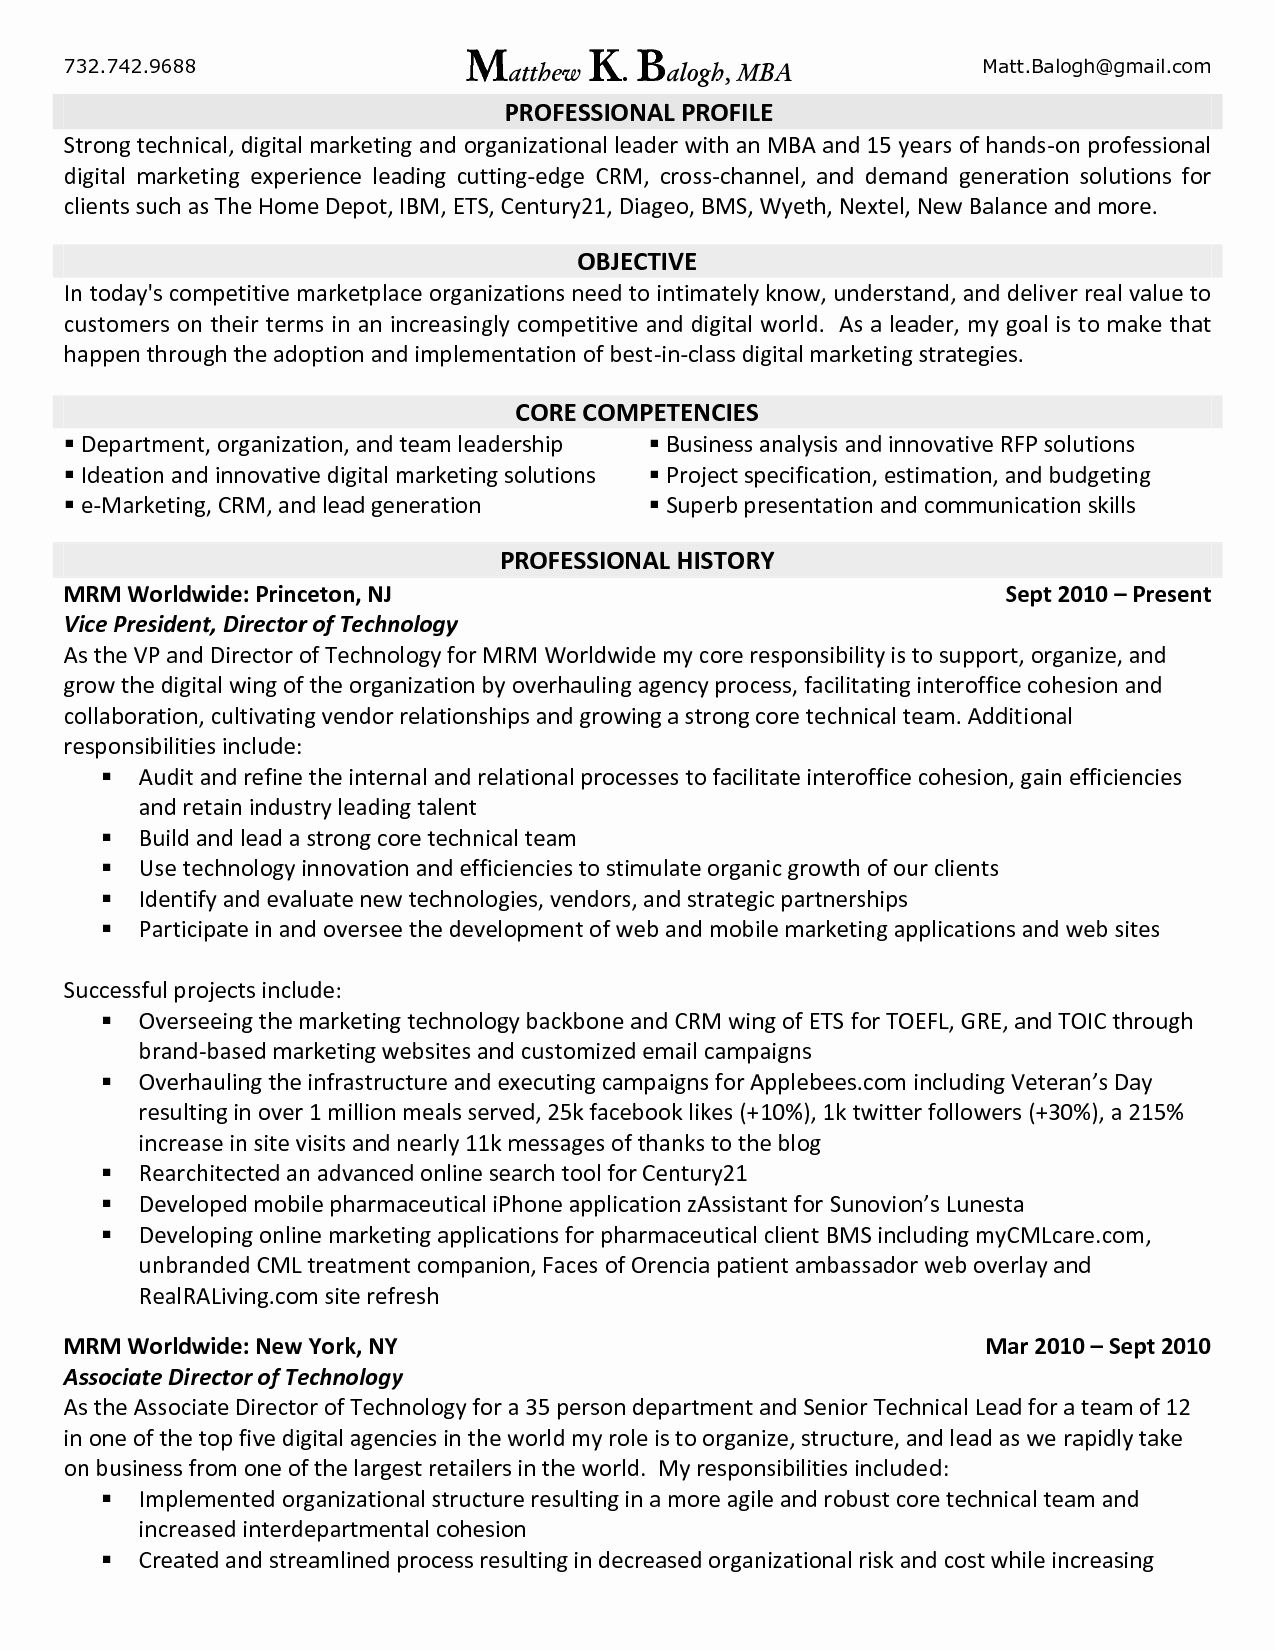 Digital Marketing Manager Resume Beautiful Digital Marketing Resume Fotolip Rich Image And Marketing Resume Digital Marketing Manager Digital Marketing